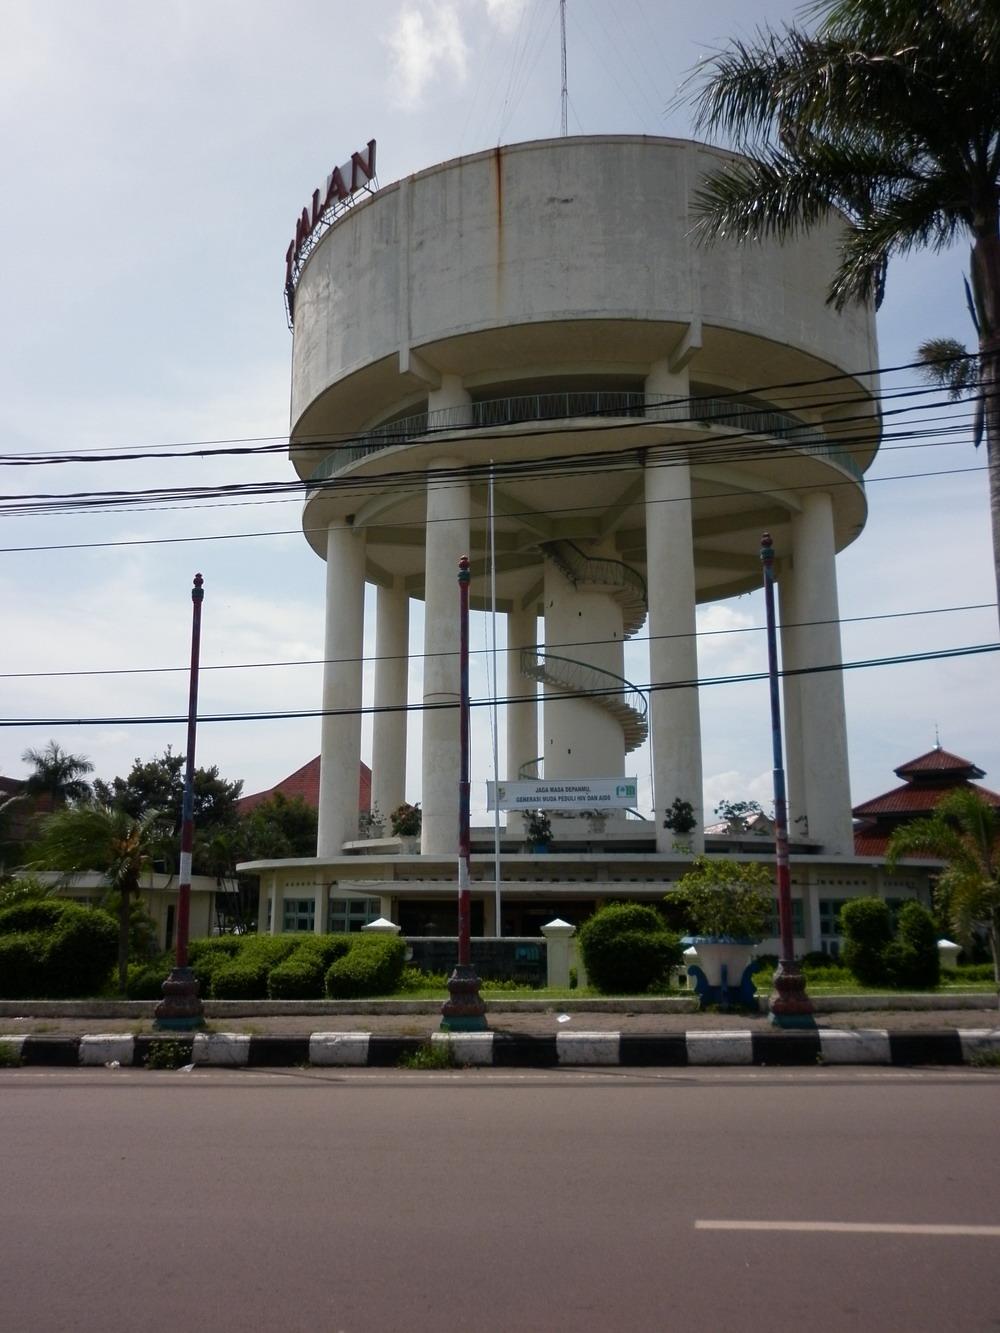 Penerimaan Cpns 2013 Kota Cirebon Lowongan Cpns Kemenkumham Terbaru September 2016 Info Pengumuman Penerimaan Calon Pegawai Pdam Kota Cirebon 2013 Firman